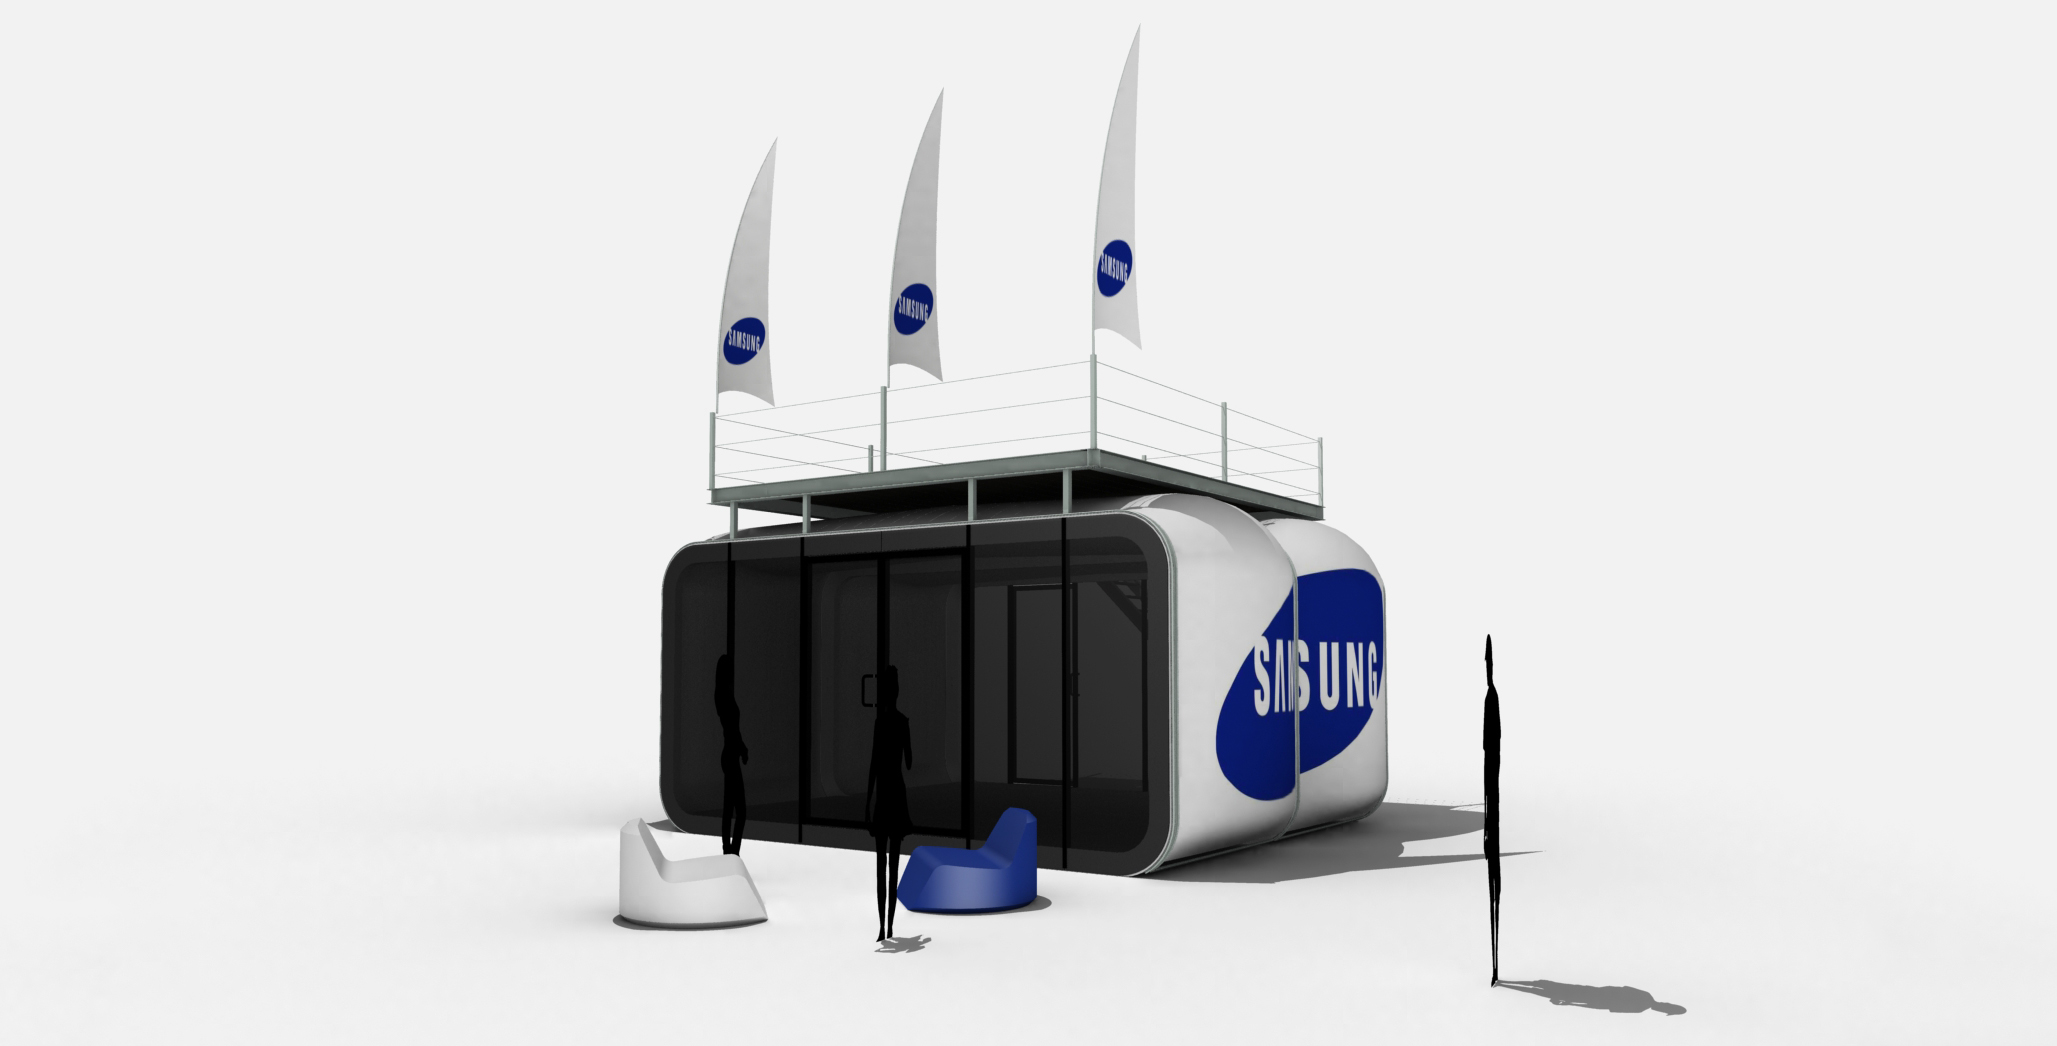 xpo6m5-terrace-Samsung-render.jpg